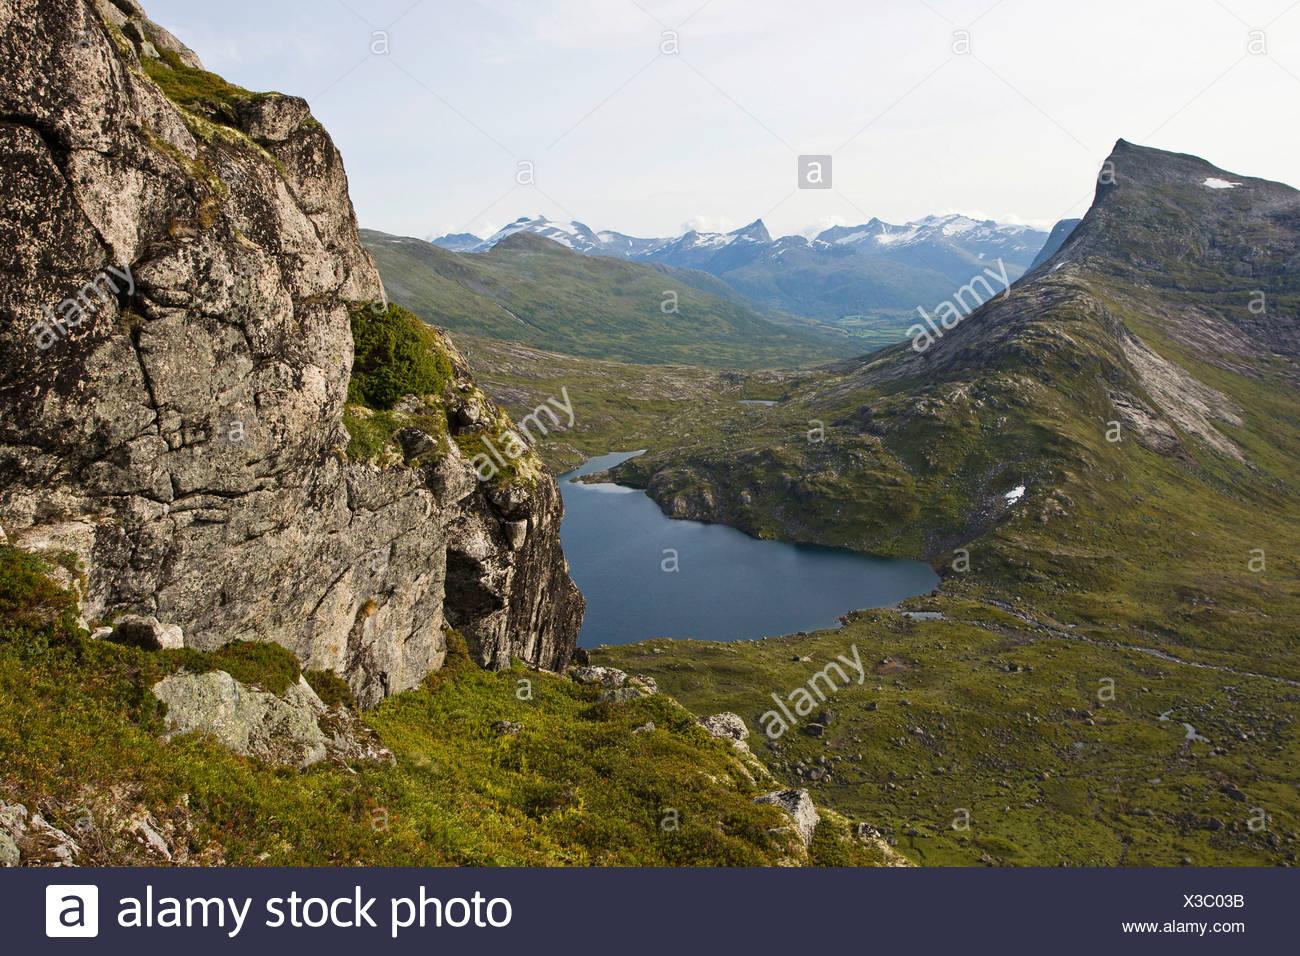 Pointy mountains, mountain lake, rocks, view, Norway, Scandinavia, Europe - Stock Image